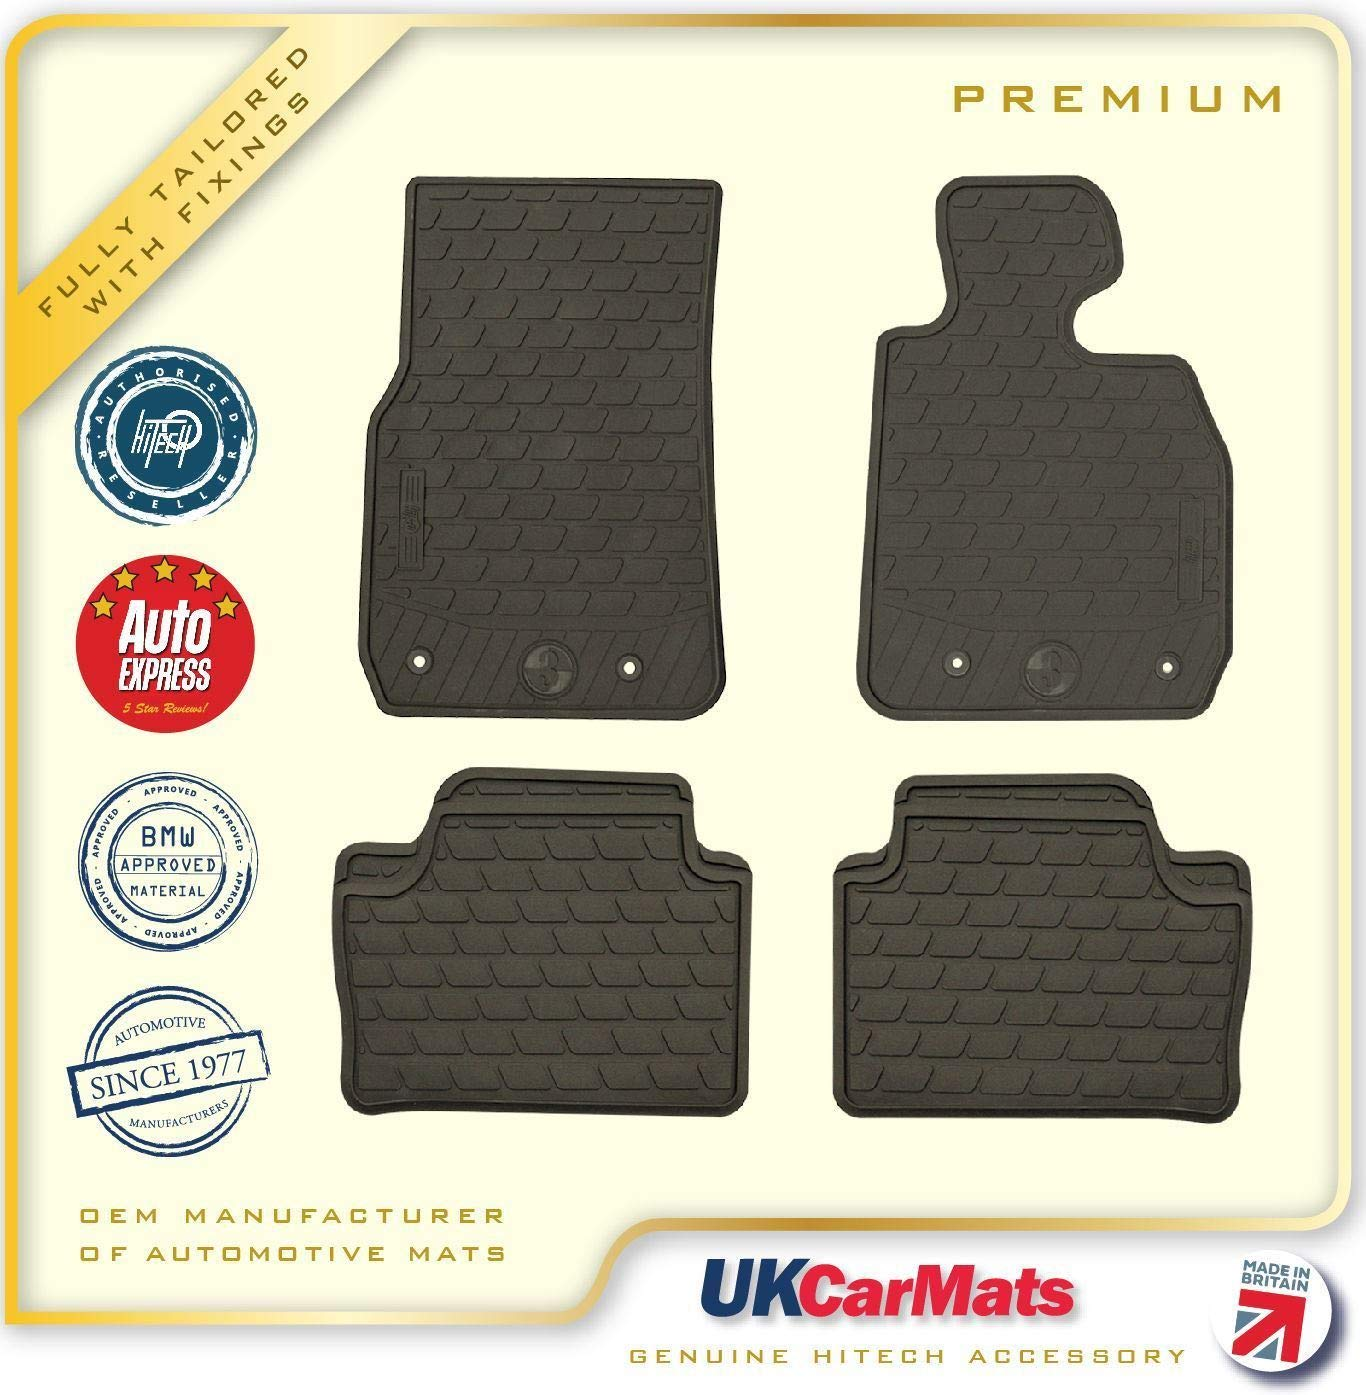 Genuine Hitech Fully Tailored Premium Rubber Mats Hitech OEM